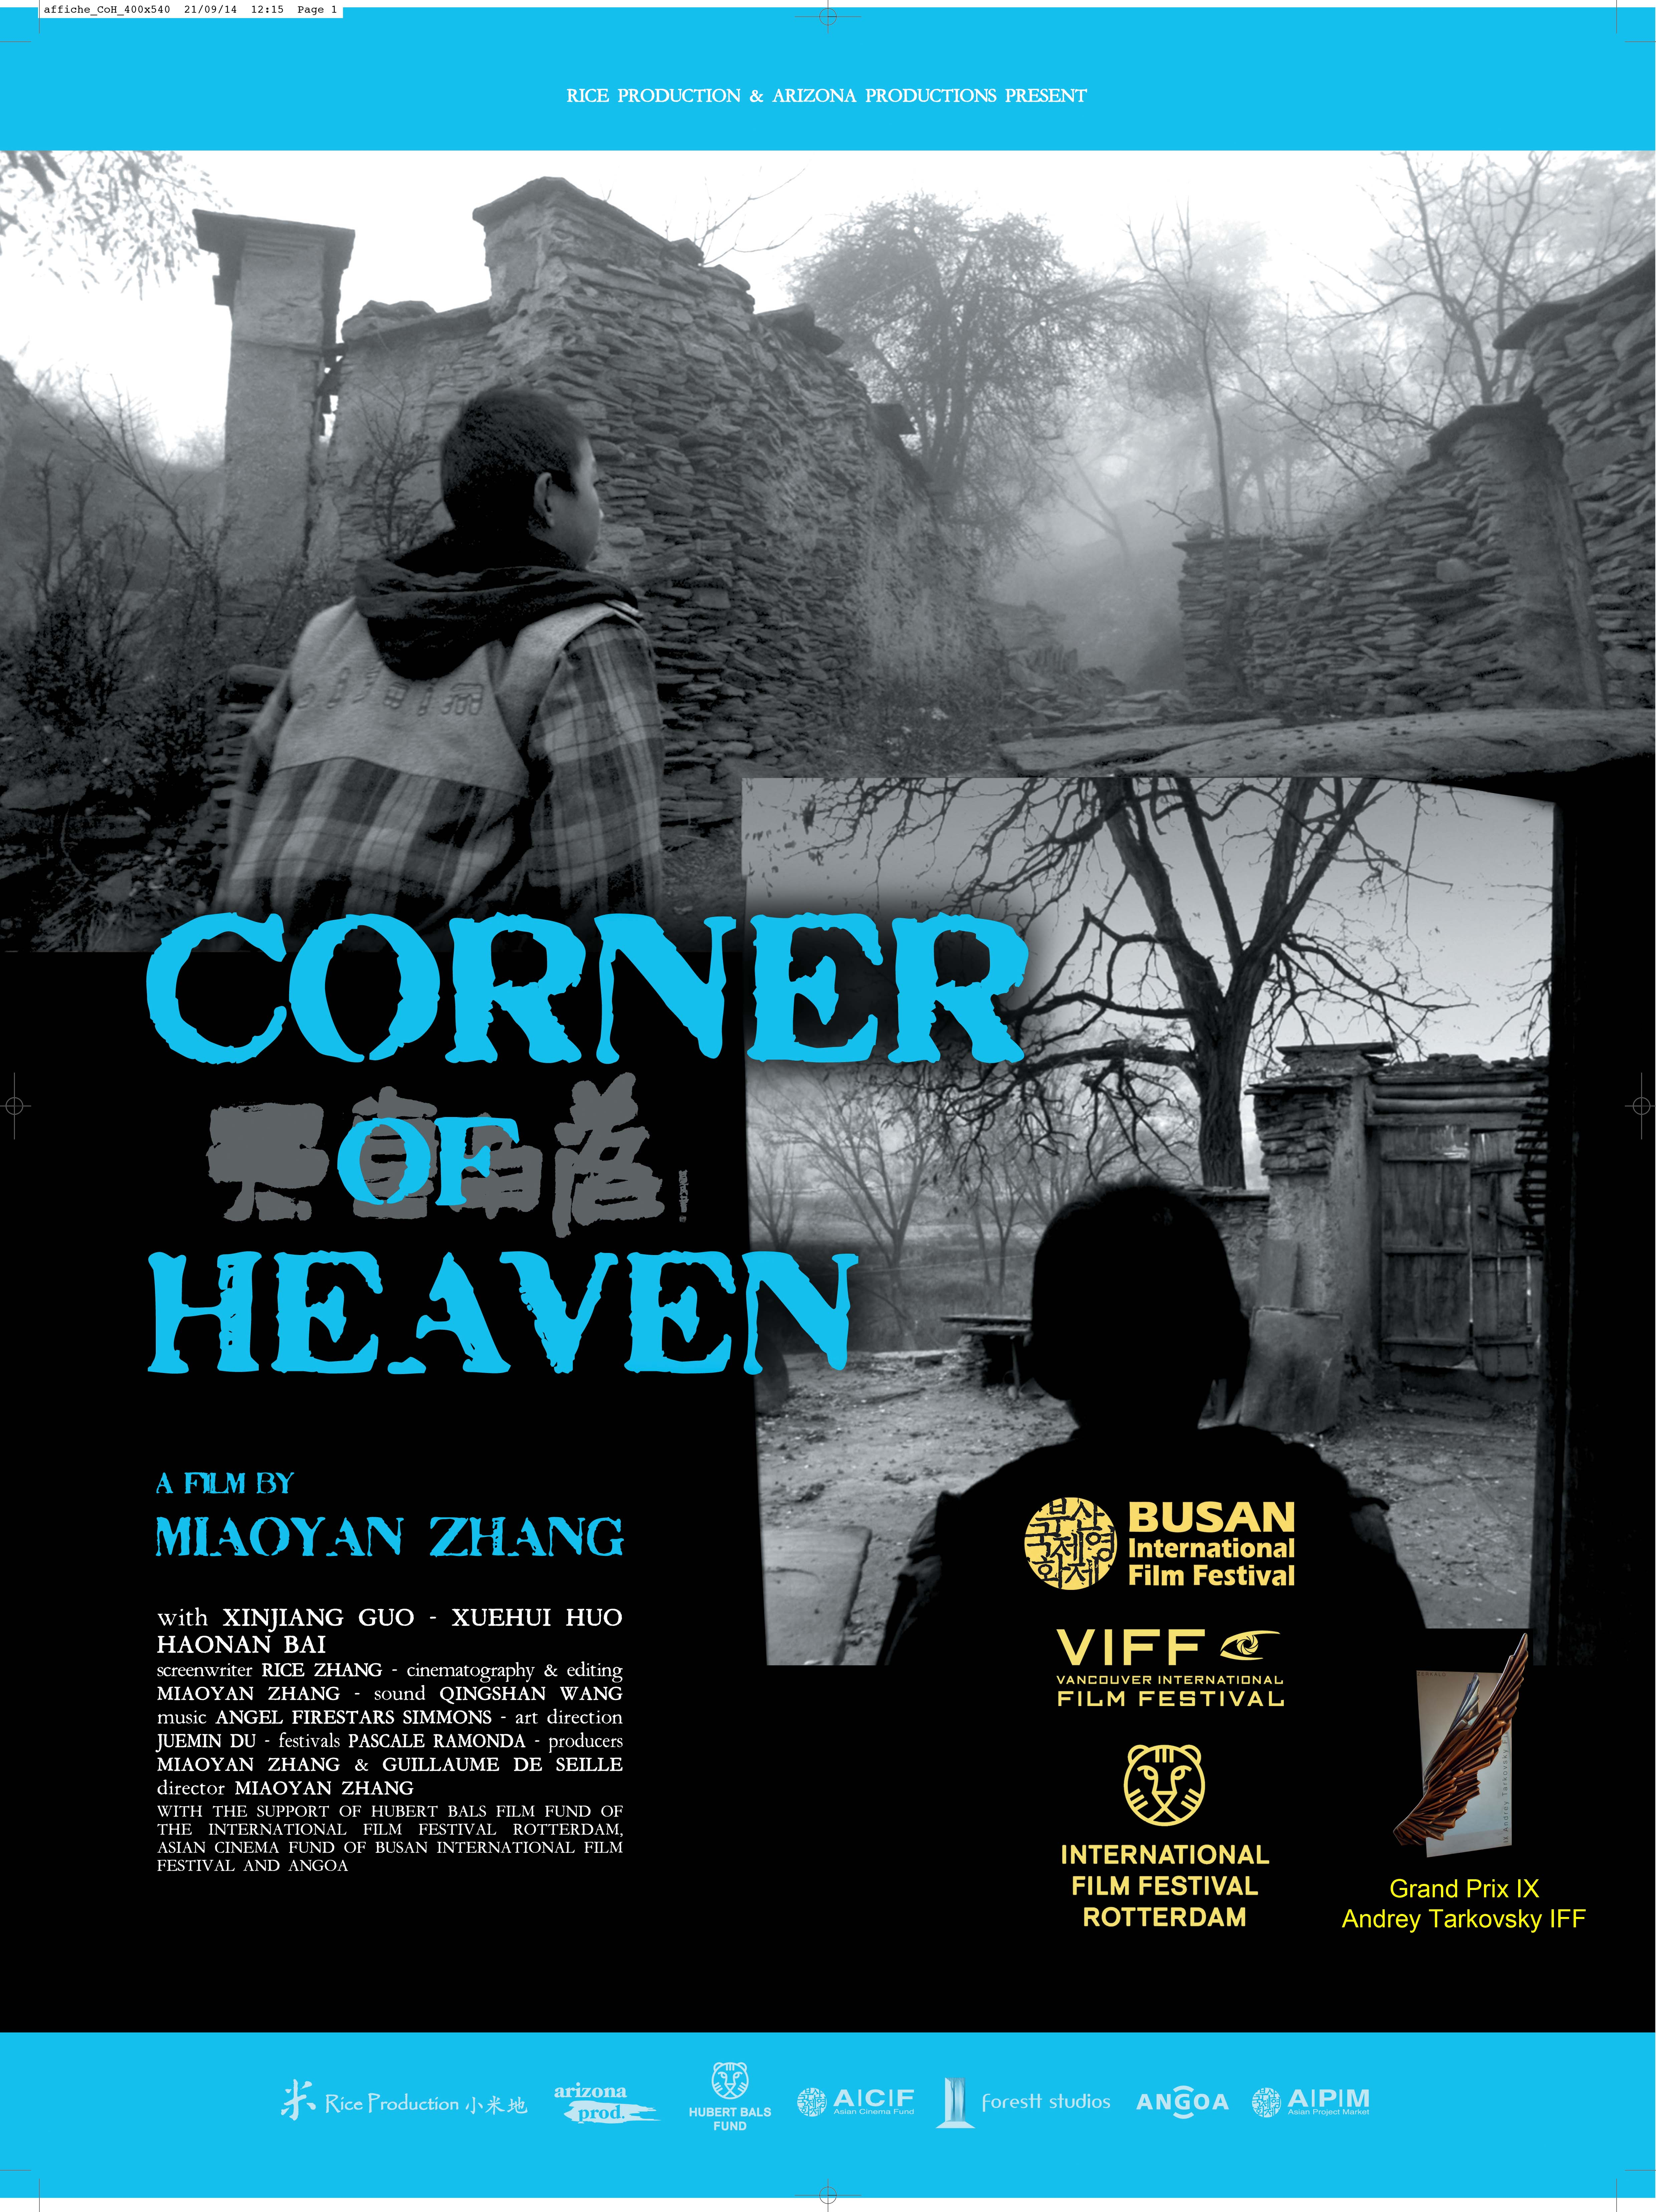 دانلود زیرنویس فارسی فیلم A Corner of Heaven